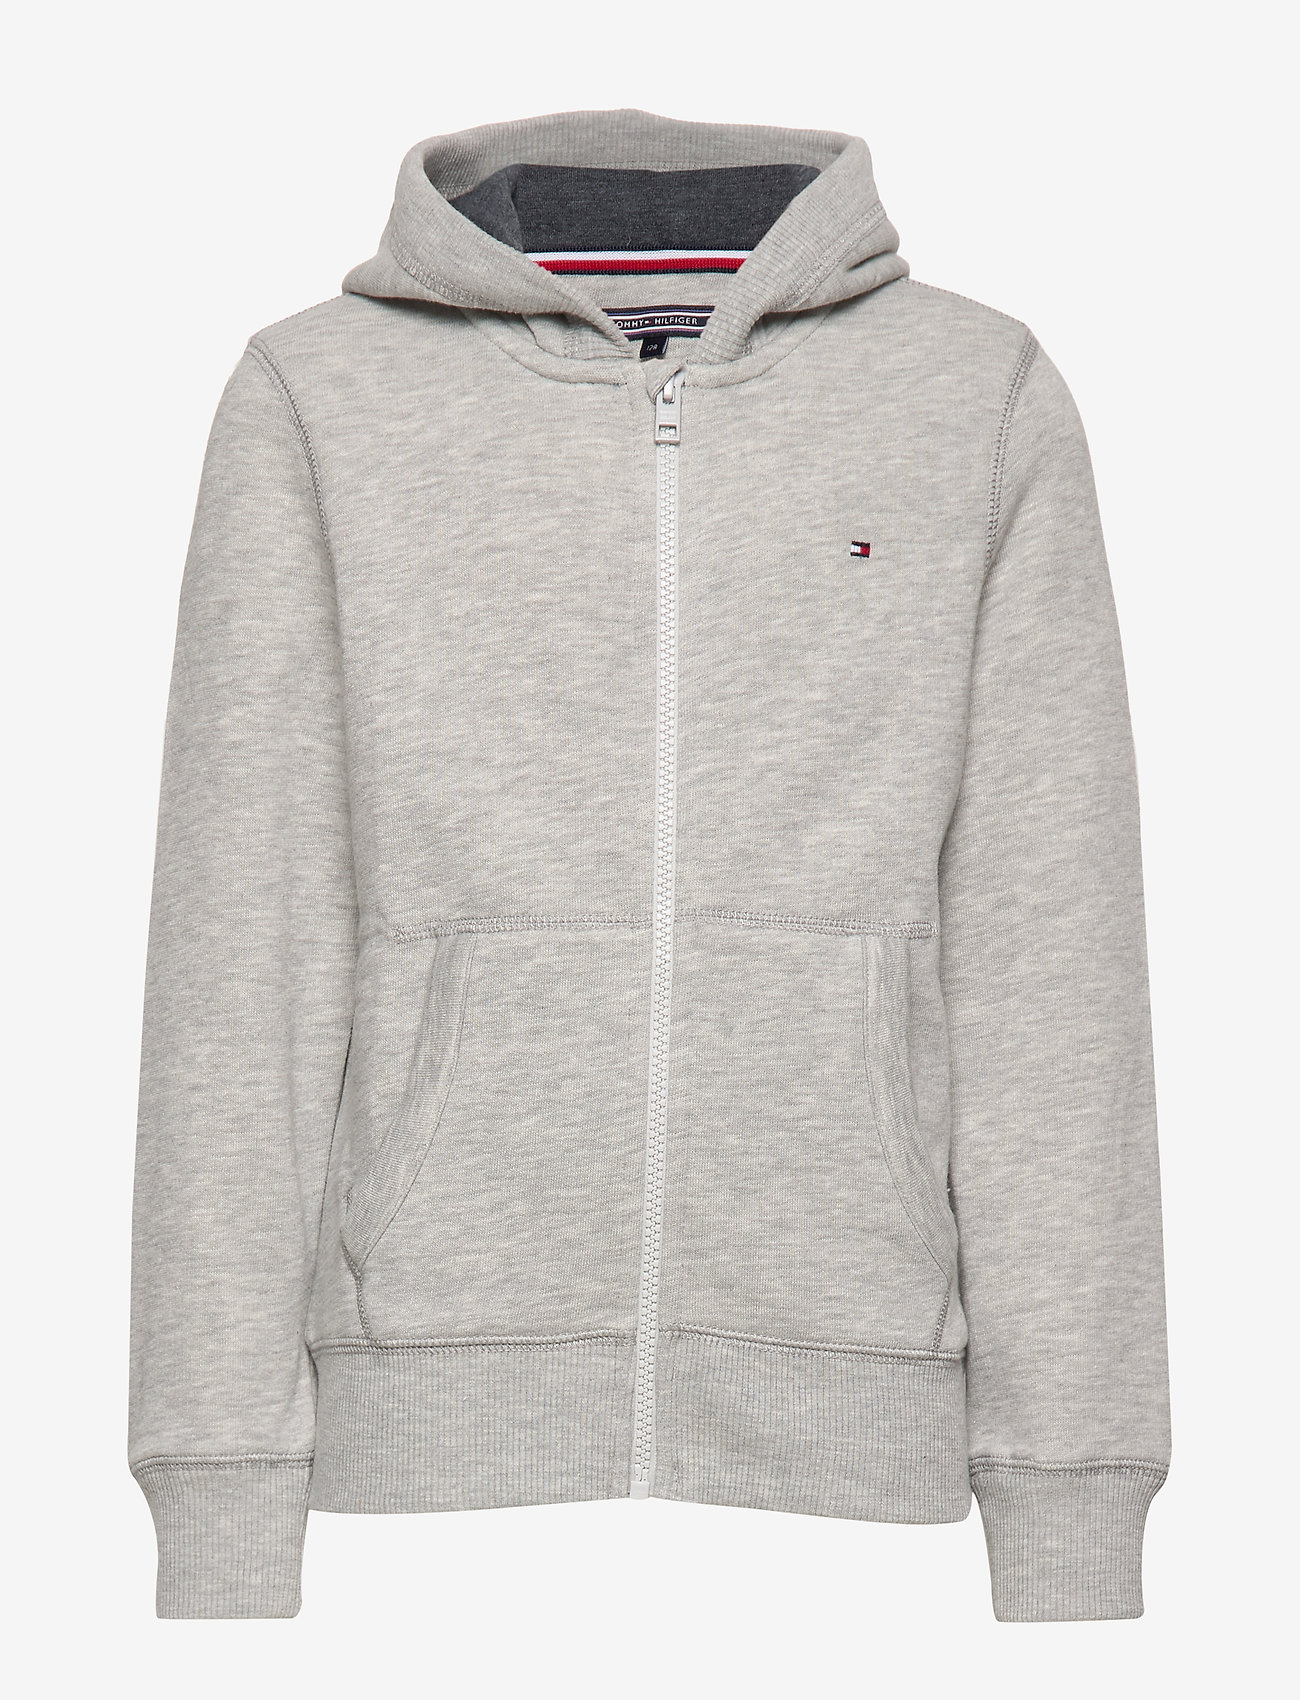 Tommy Hilfiger - BOYS BASIC ZIP HOODI - hoodies - grey heather - 0